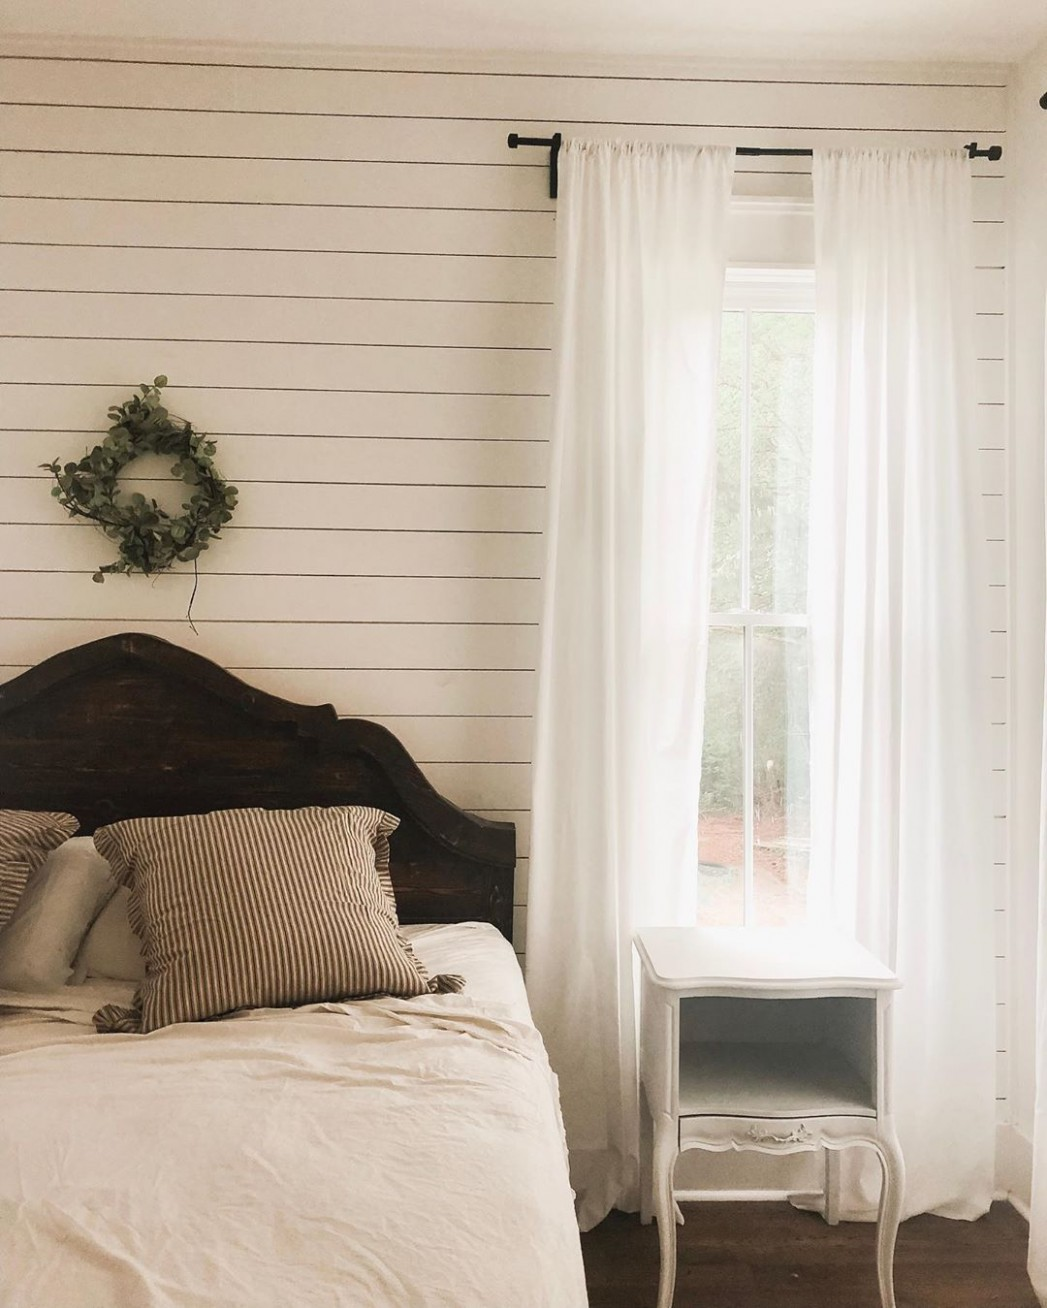 9 Best Bedroom Curtain Ideas - Easy Ideas for Bedroom Window  - Window Ideas For Bedroom